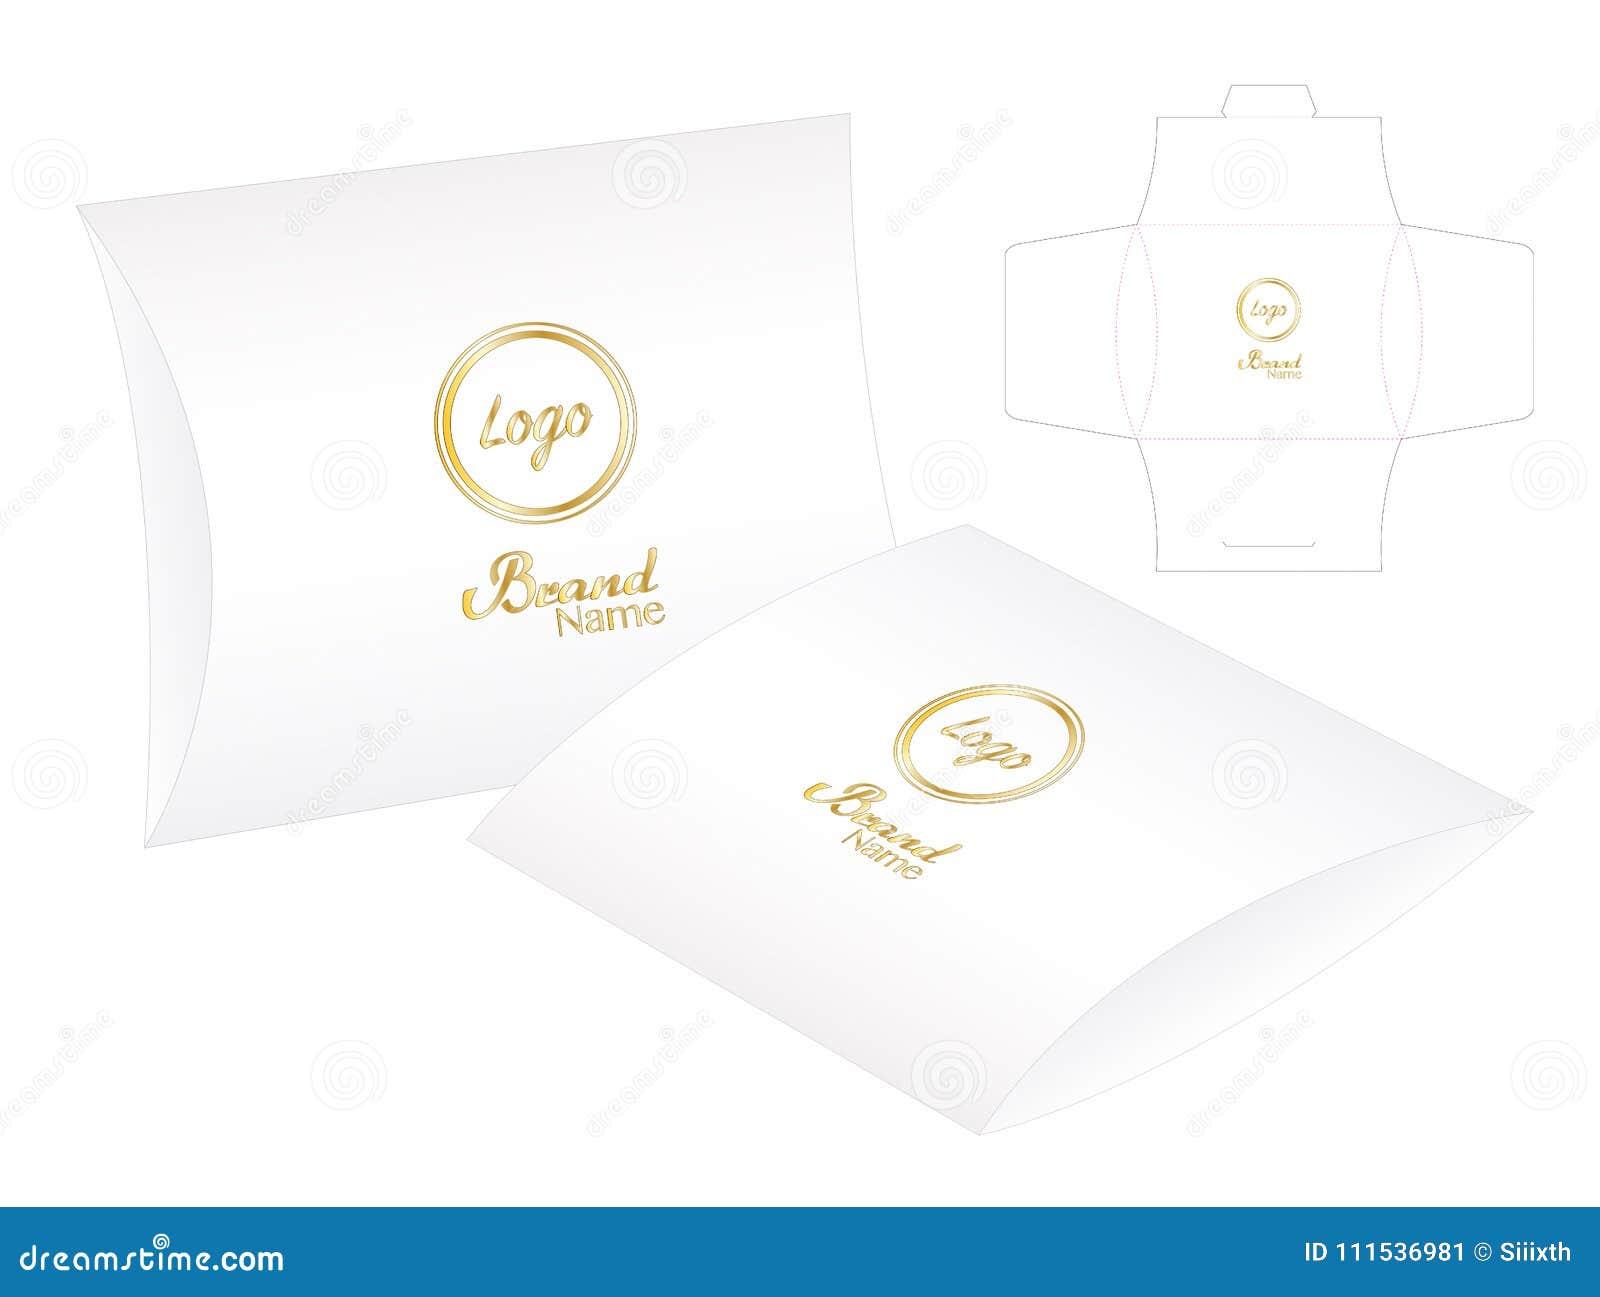 pillow pack box die cut template mockup 3d stock vector